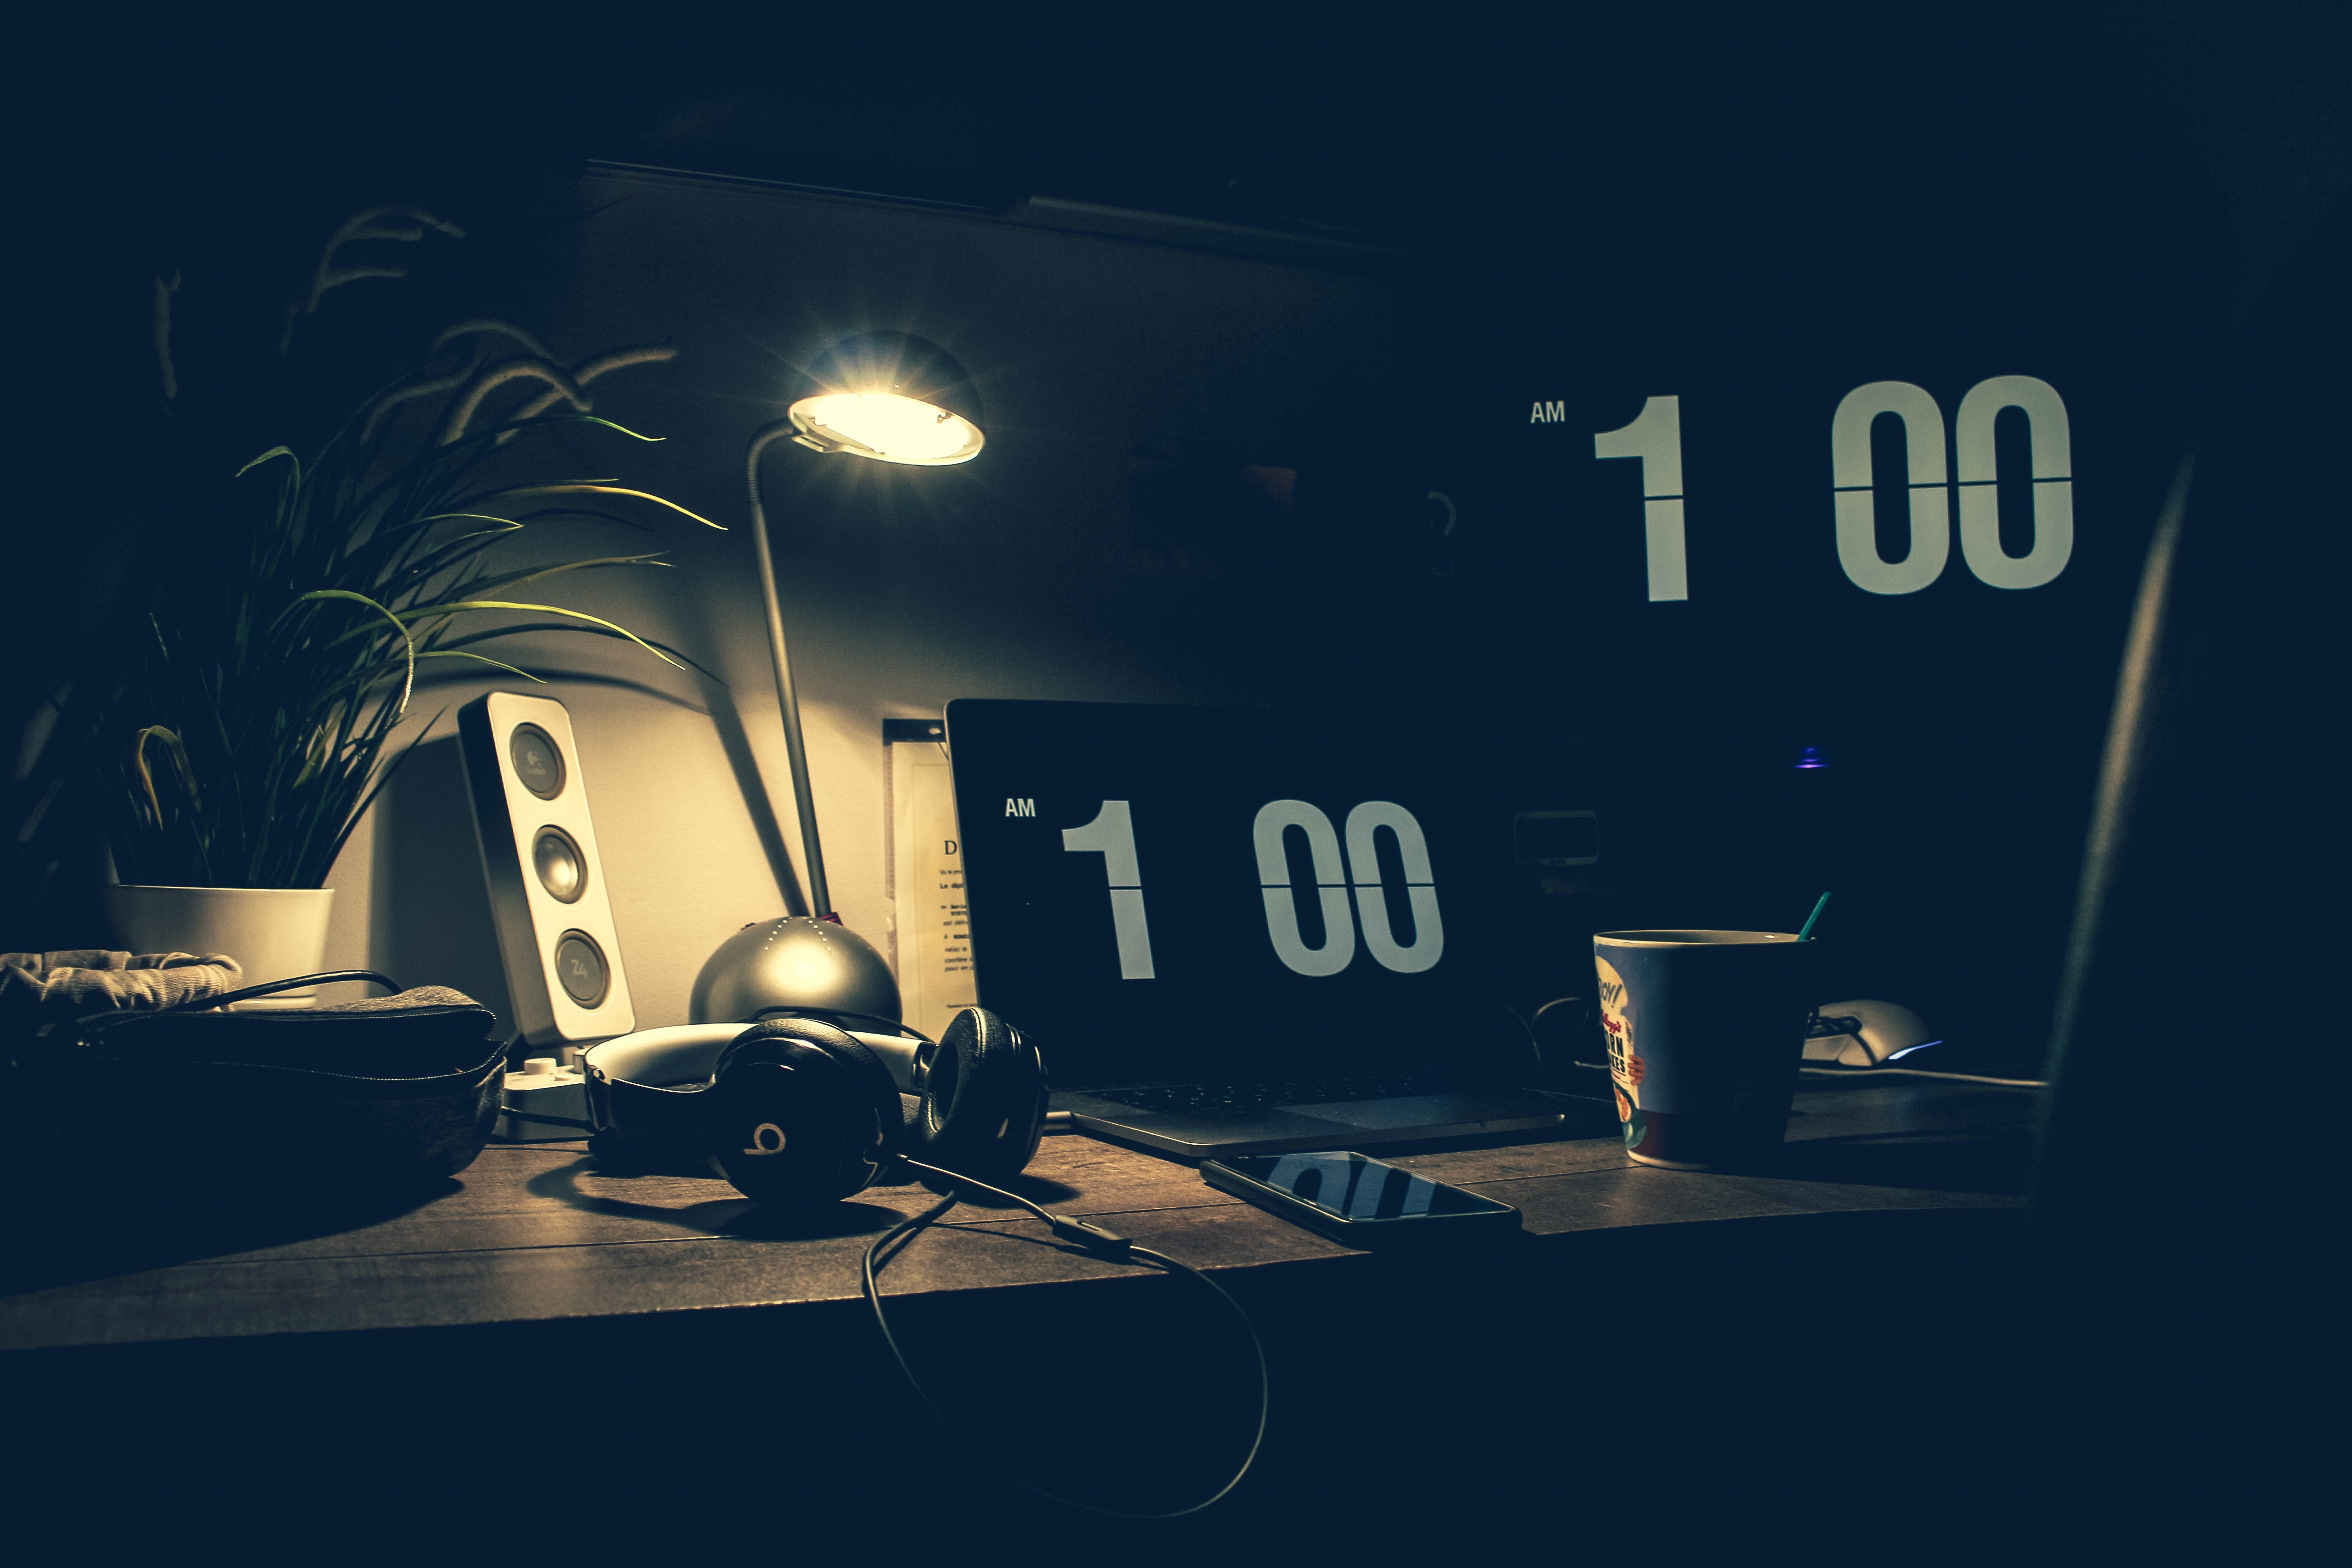 Black digital alarm clock at 1:00 photo